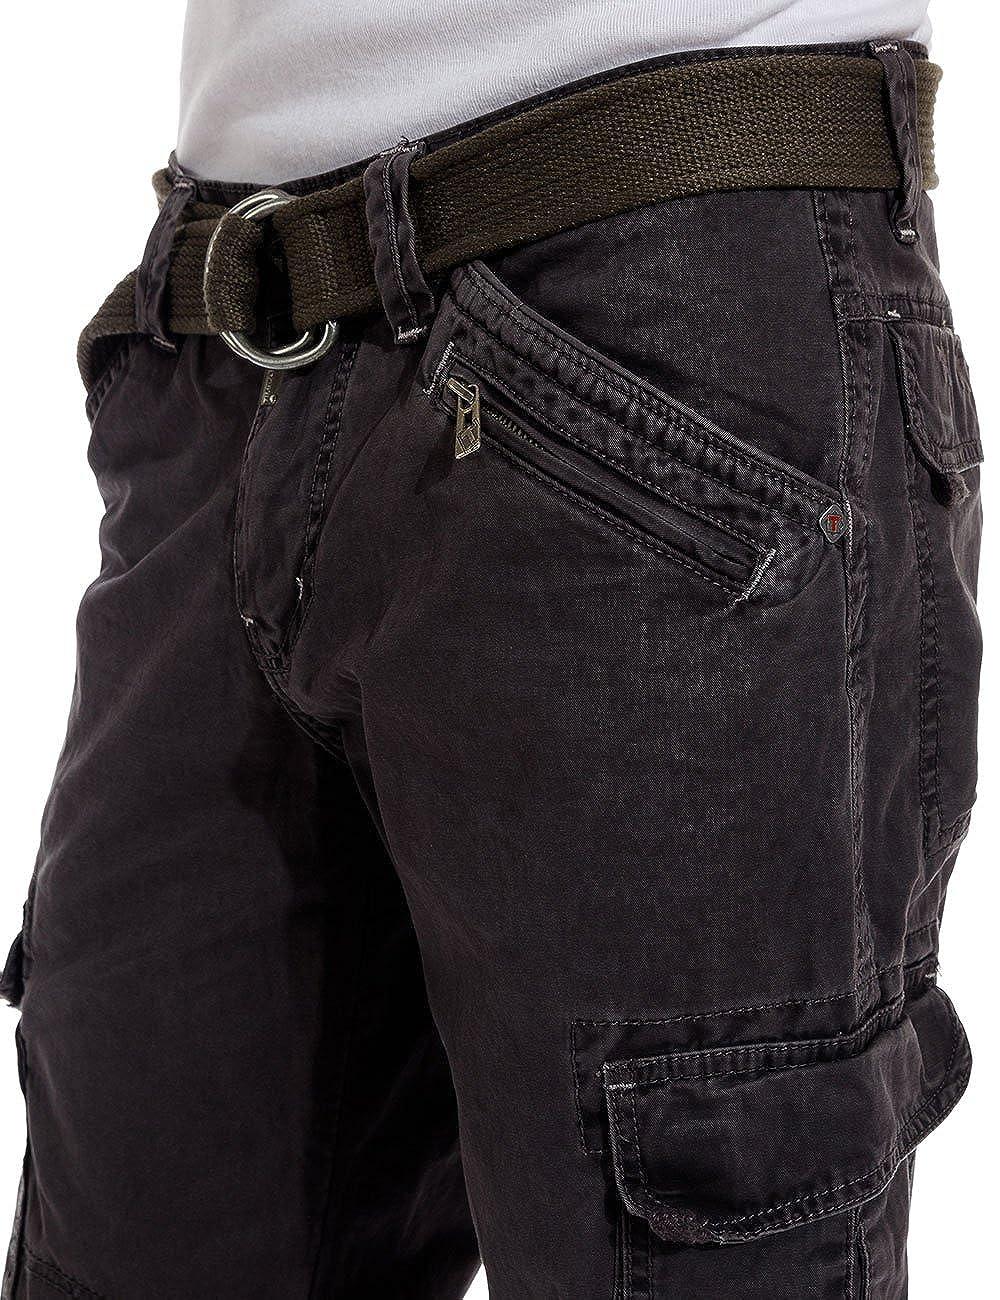 Homme Timezone Pantalon Droit